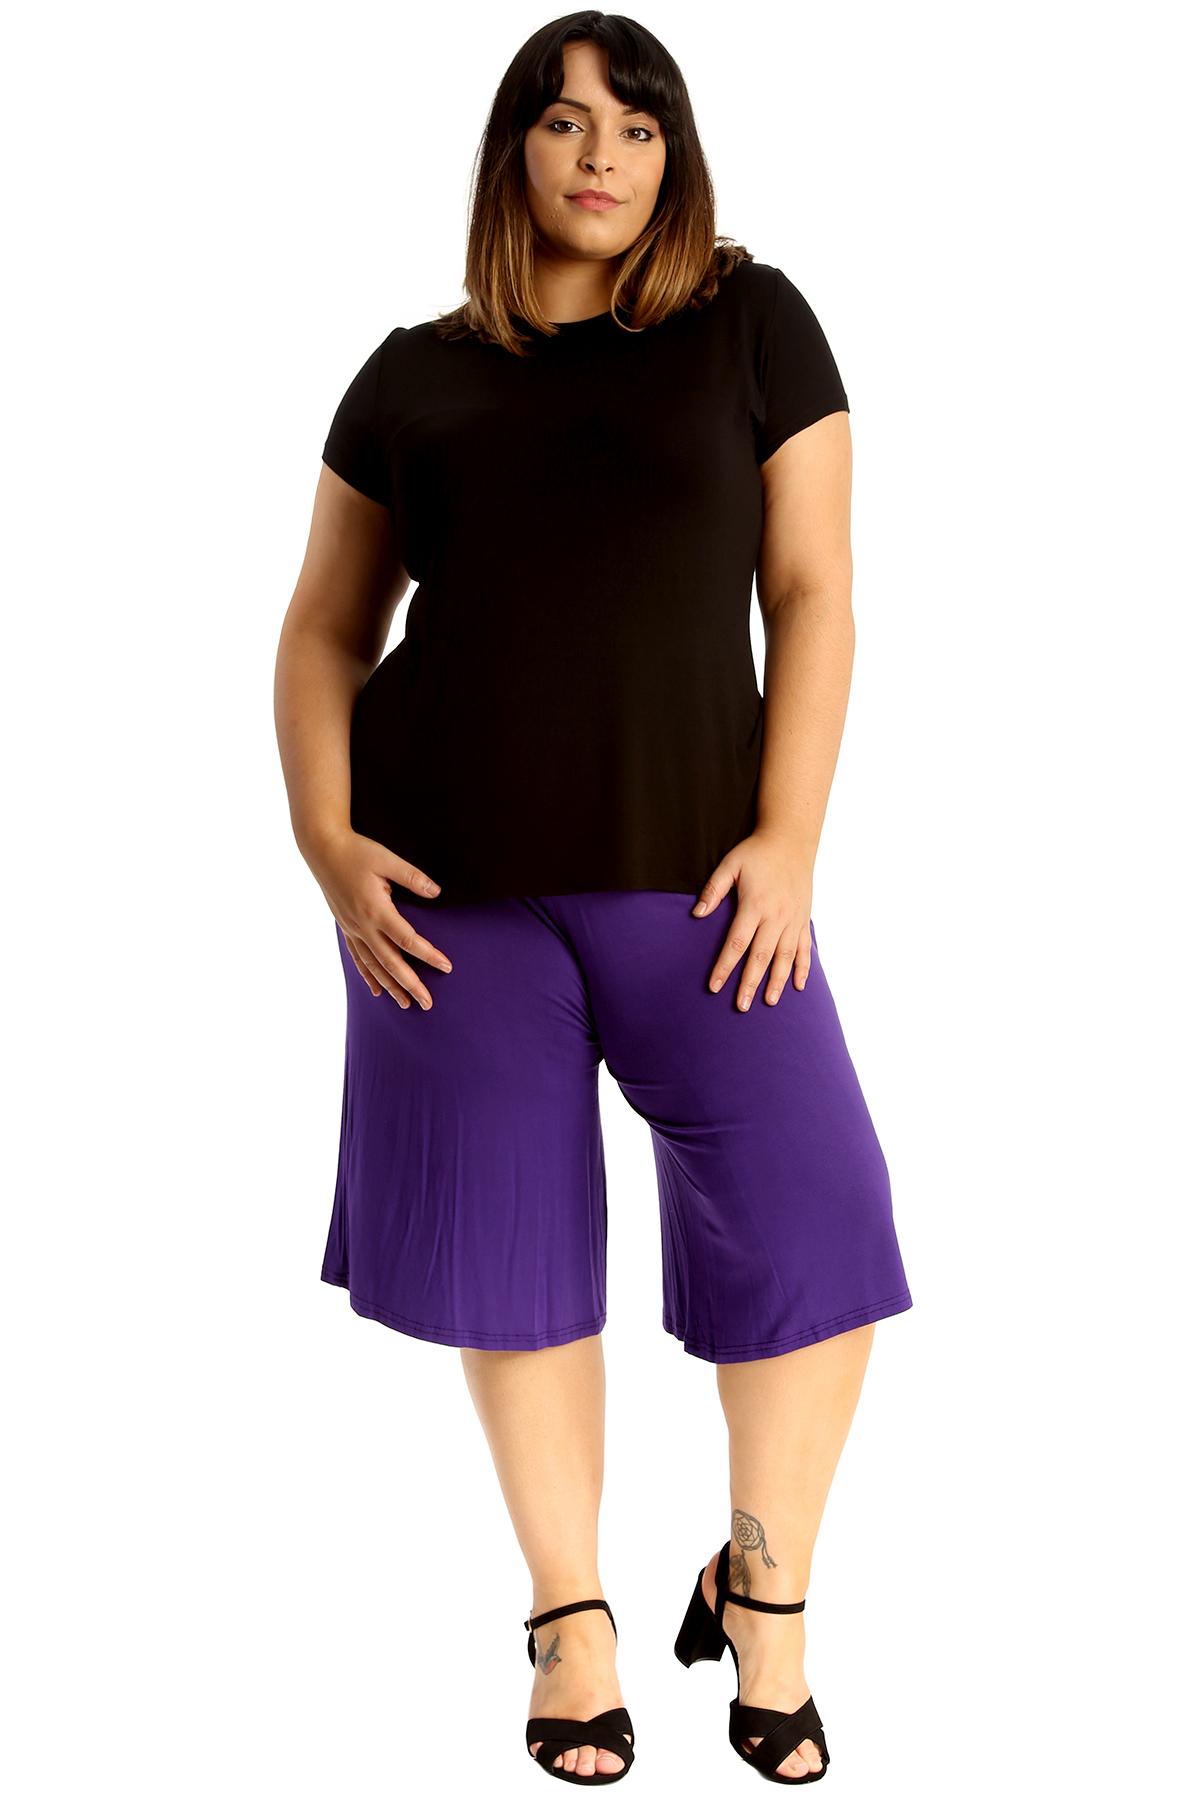 New-Womens-Plus-Size-Culottes-Ladies-Plain-Shorts-Palazzo-Elastic-Pants-Summer thumbnail 31